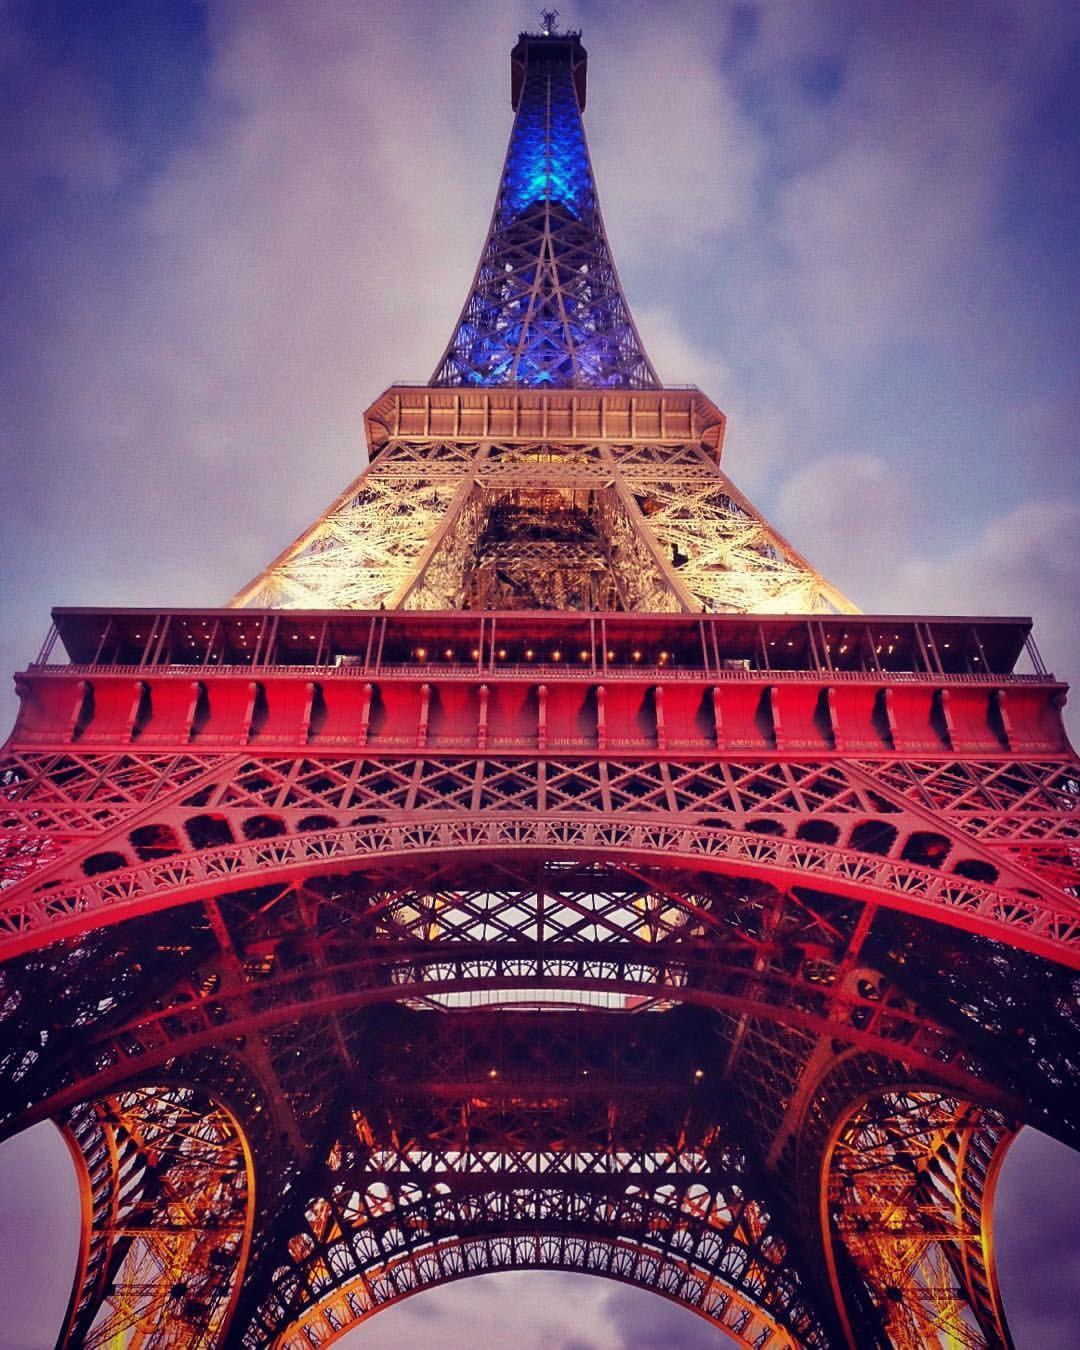 "Cédric (ex Cedsebbenj) on Instagram: "" Paris • 25-11-15 • #Париж #باريس #巴黎 #パリ#parís #parigi @super_france @astotel #ASTOTEL_SUPERFRANCE @ghp_experience #monpatrimoinebyGHP"""